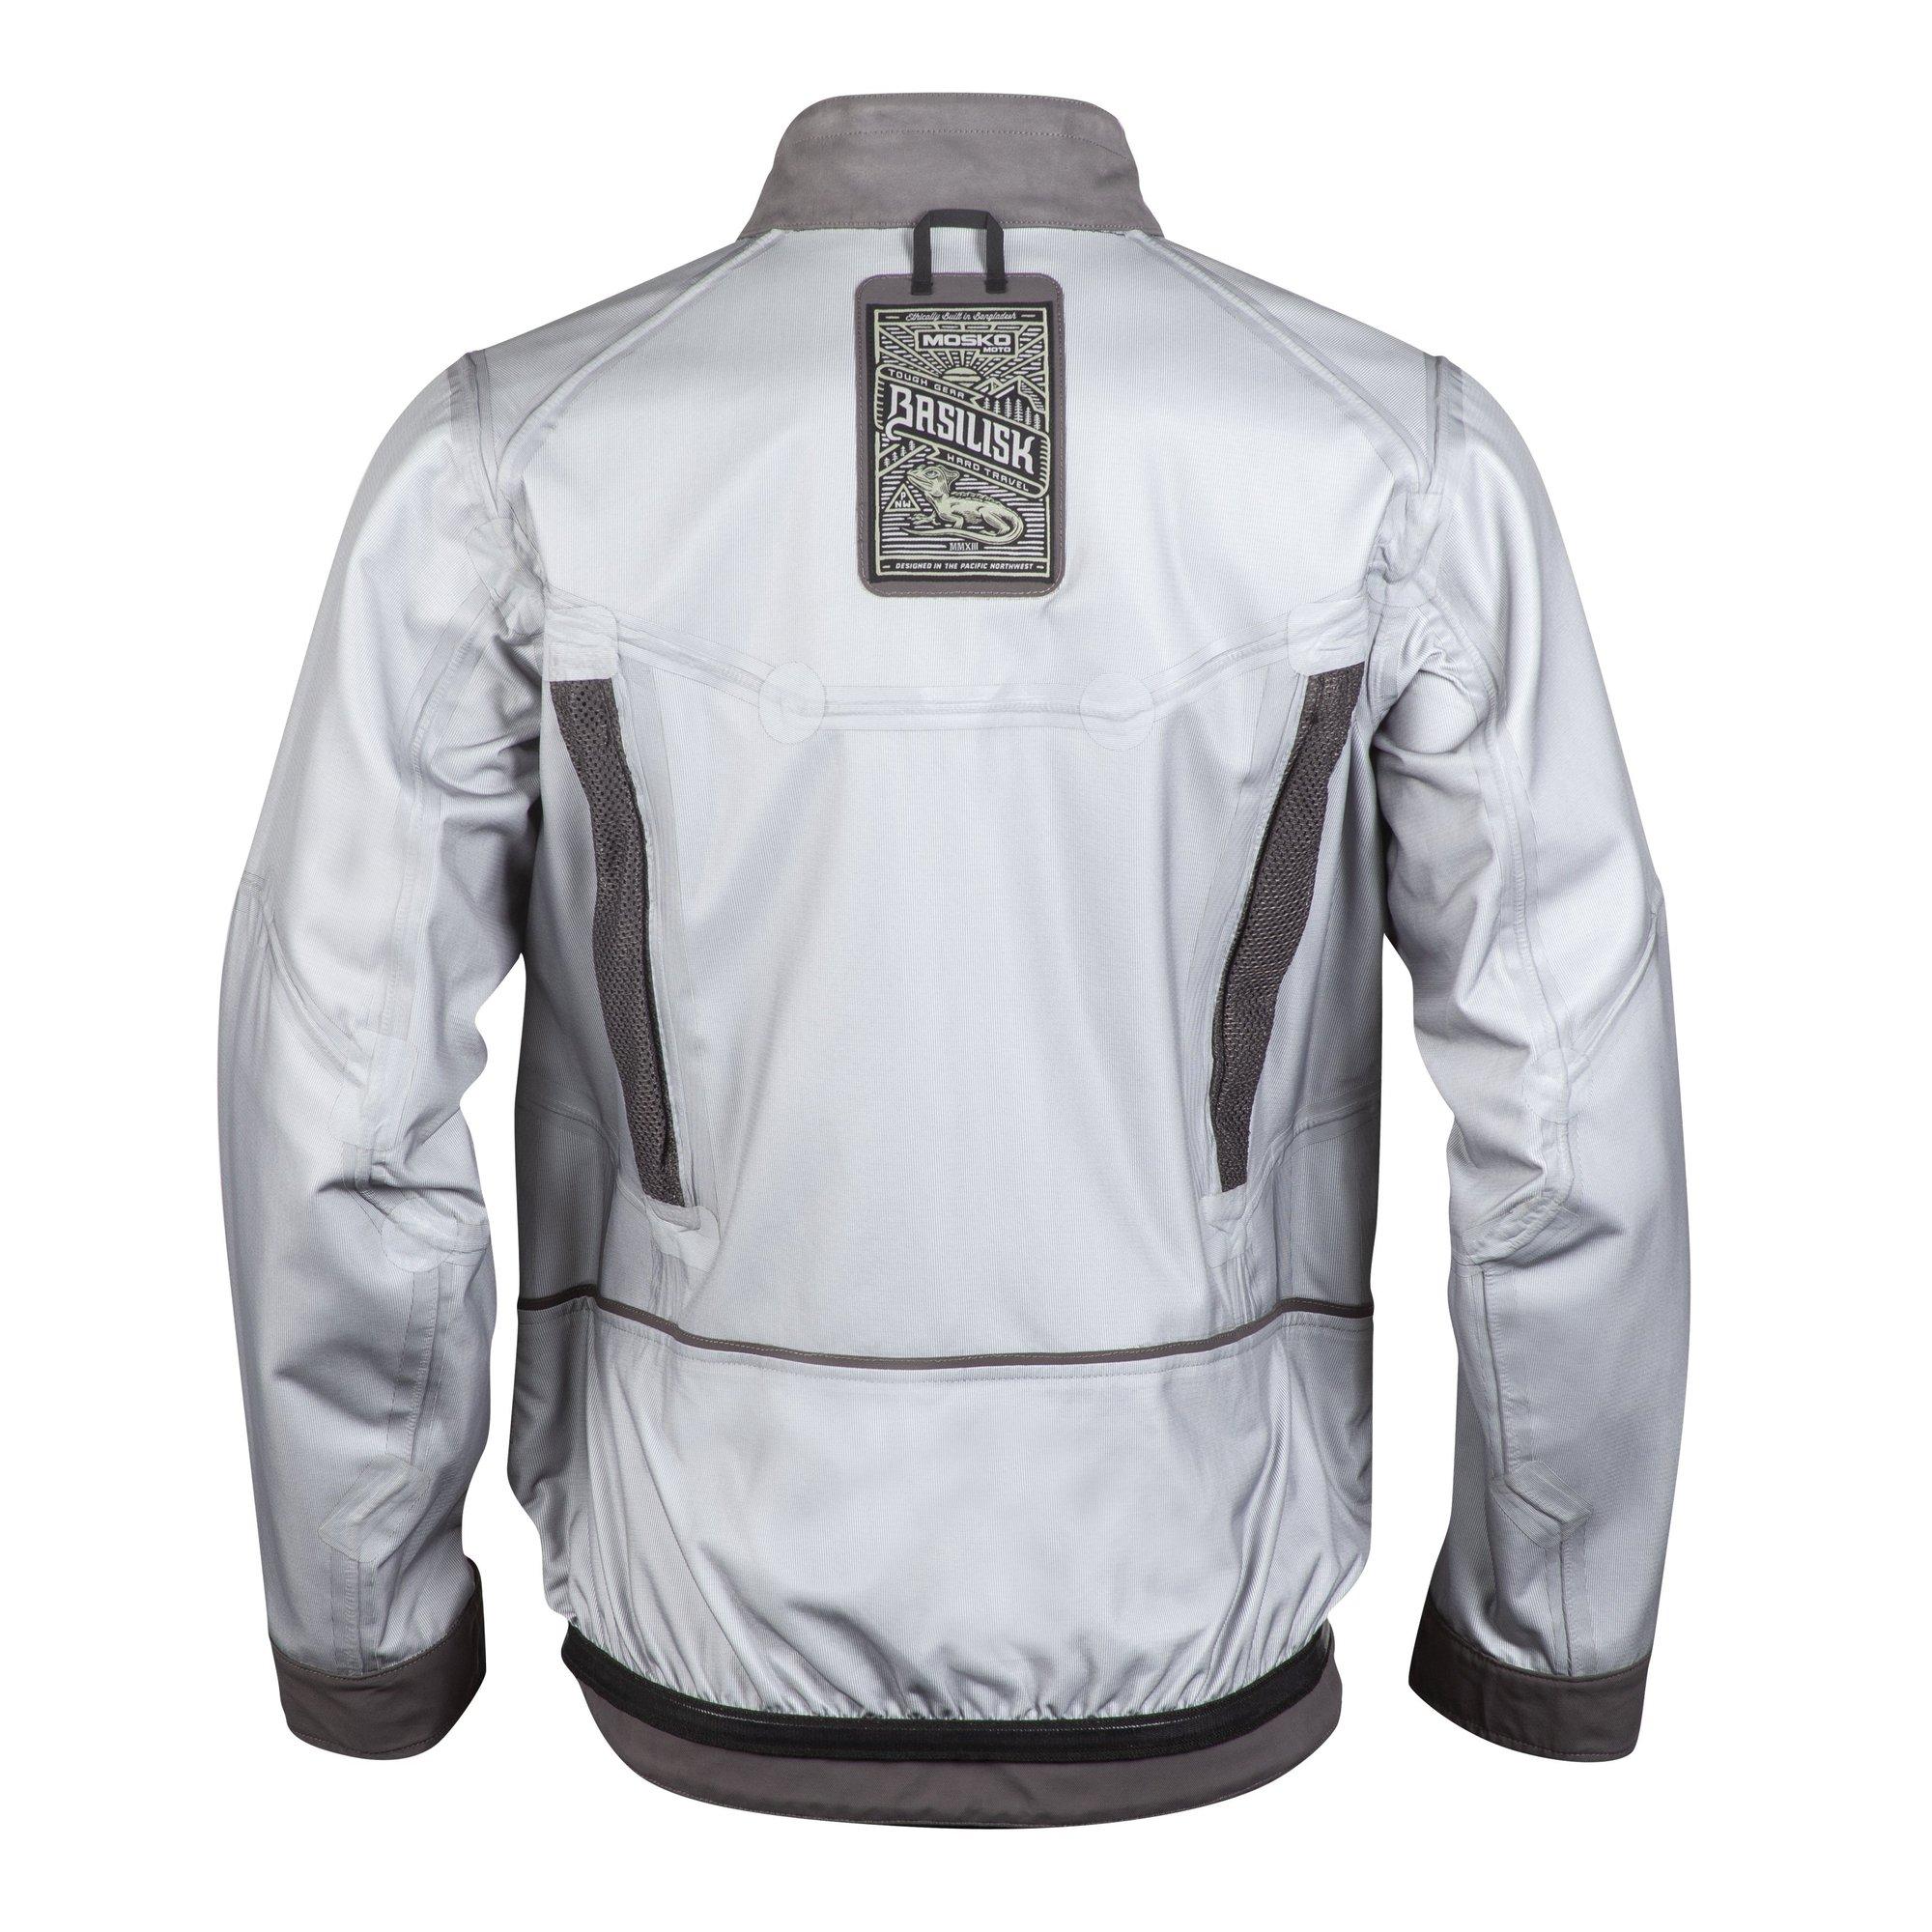 mosko-moto-apparel-s-charcoal-basilisk-jacket-11332267900989_2000x.jpg